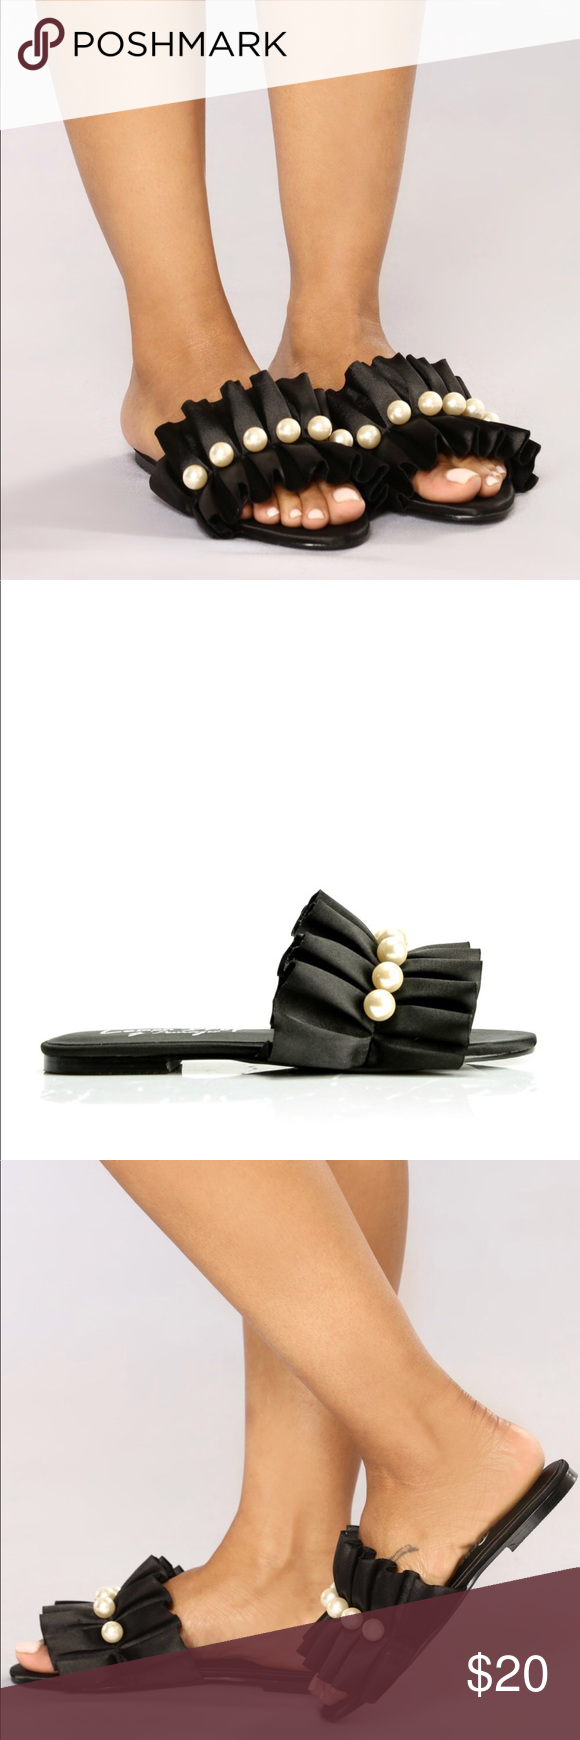 cec7777c8e4 Fashion Nova Satin Slides Black satin slides with faux pearl  embellishments. Brand new